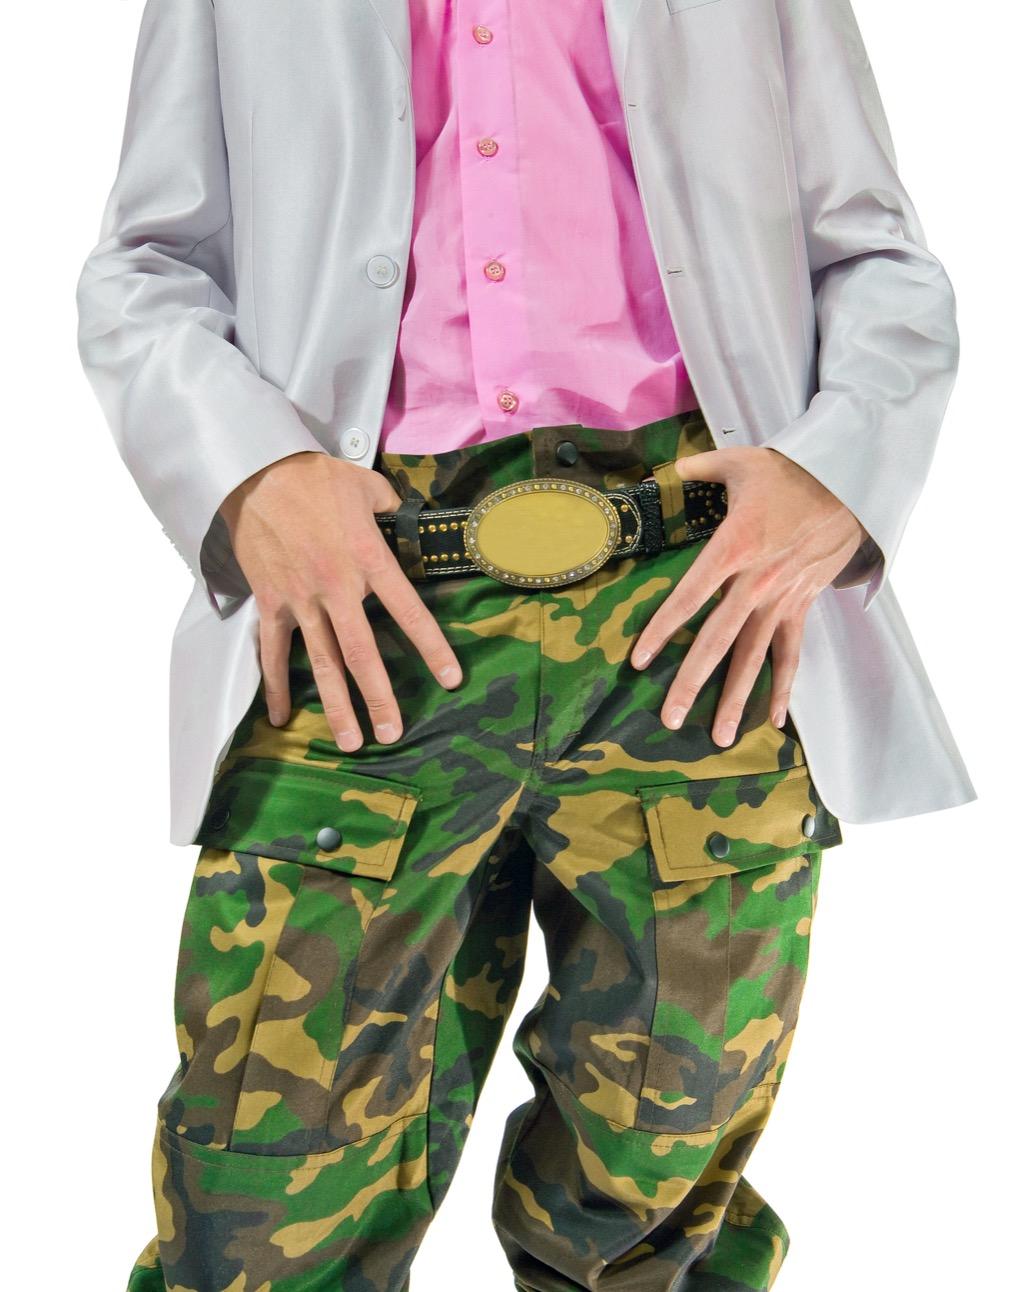 no man should wear camo pants to work